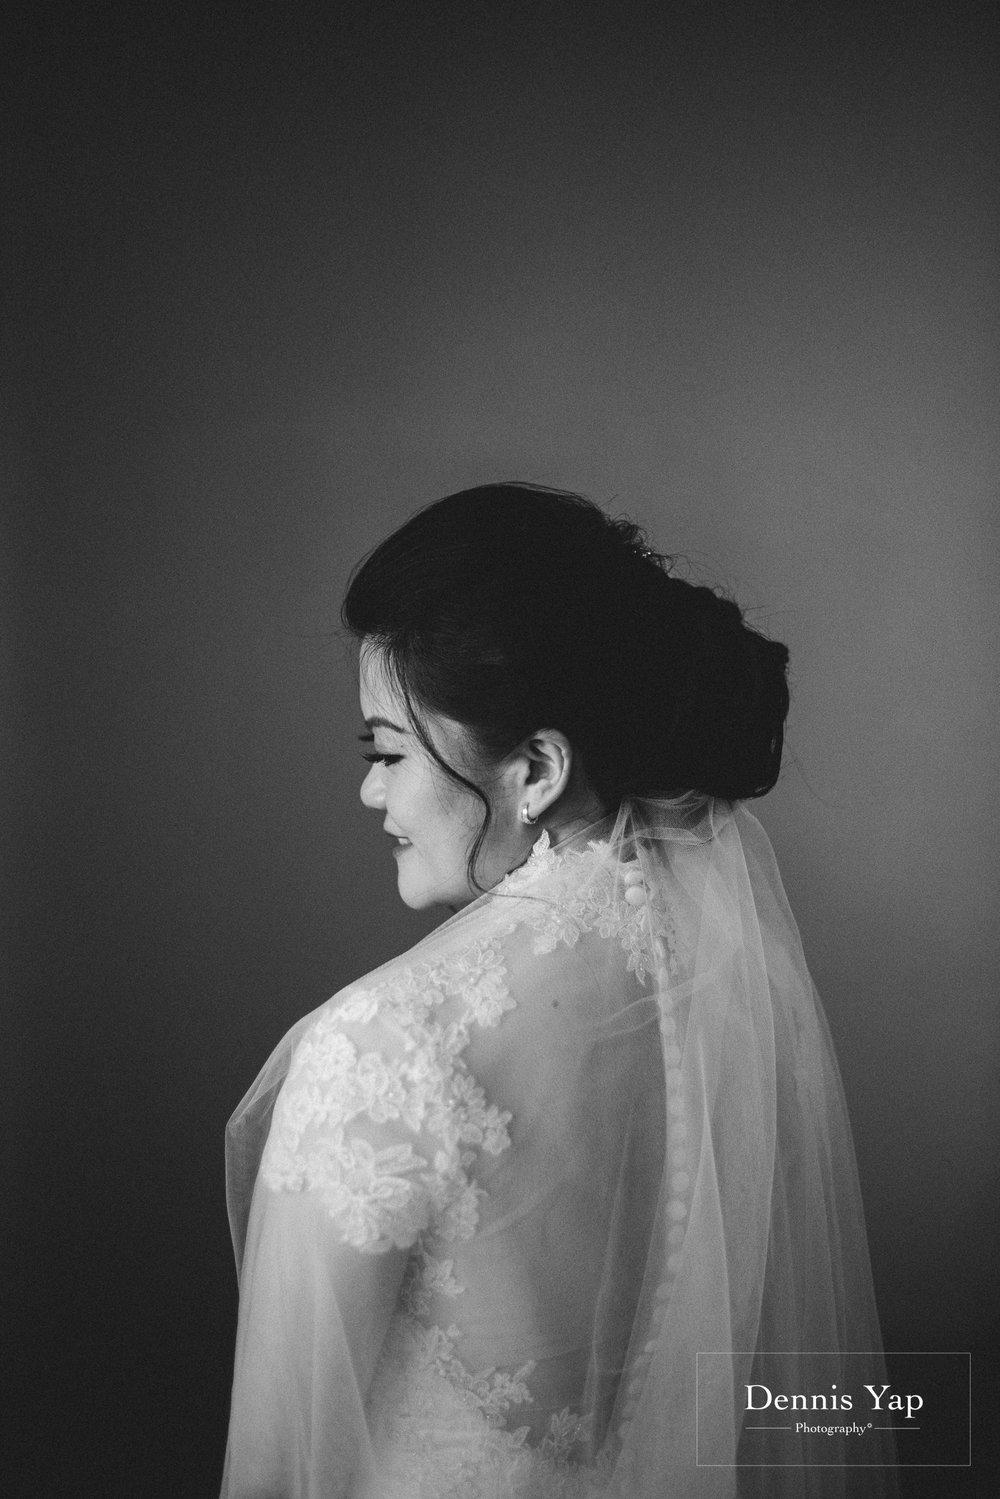 kok jin hooi woon wedding day klang dennis yap photography-3.jpg